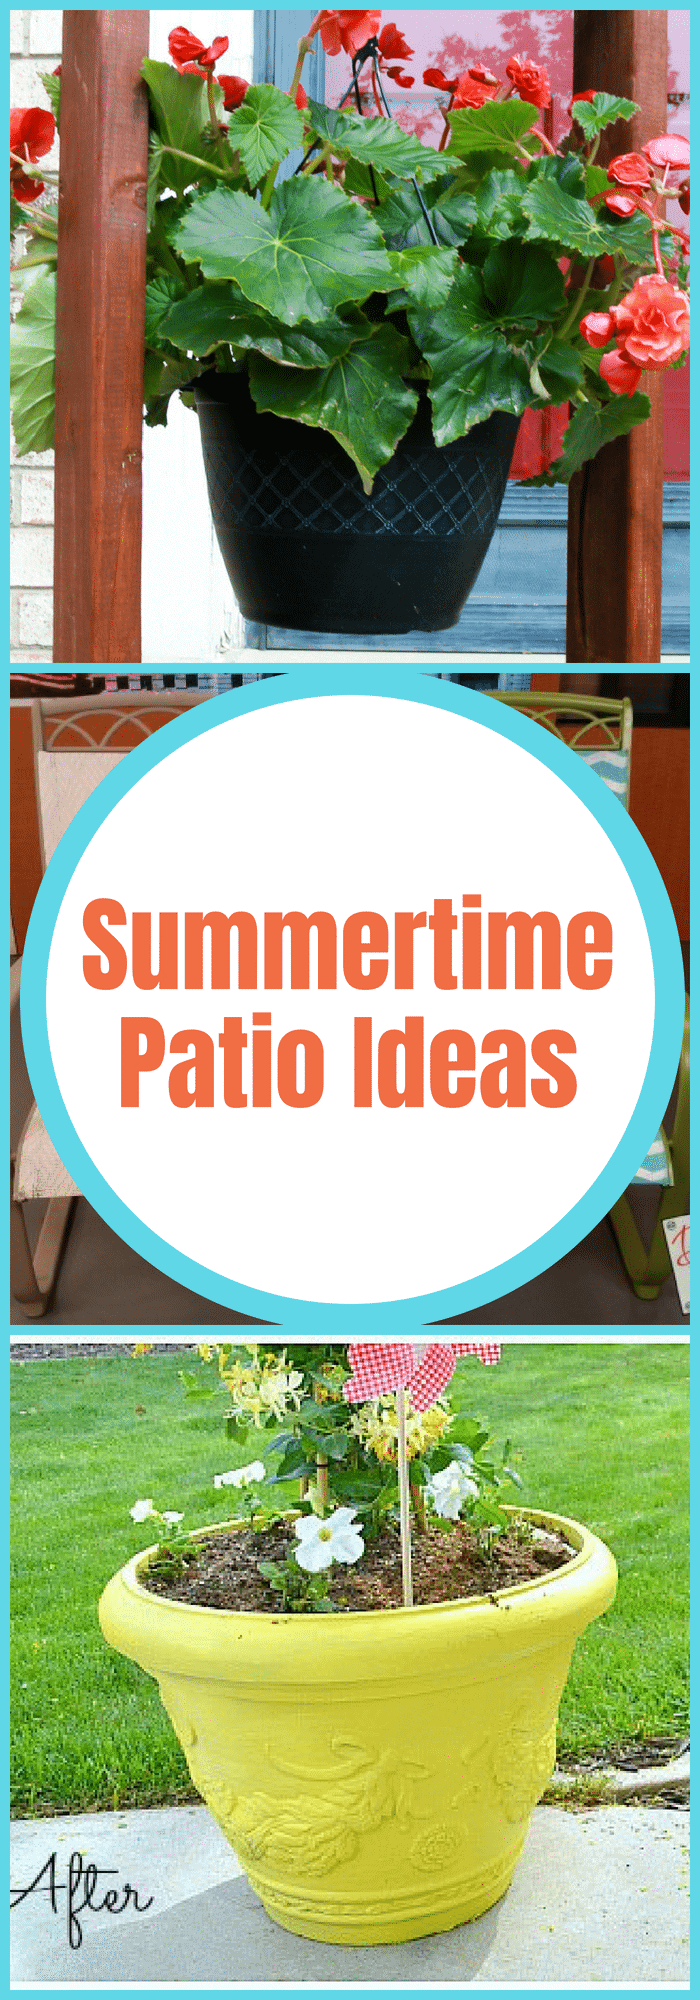 Summertime Patio Ideas